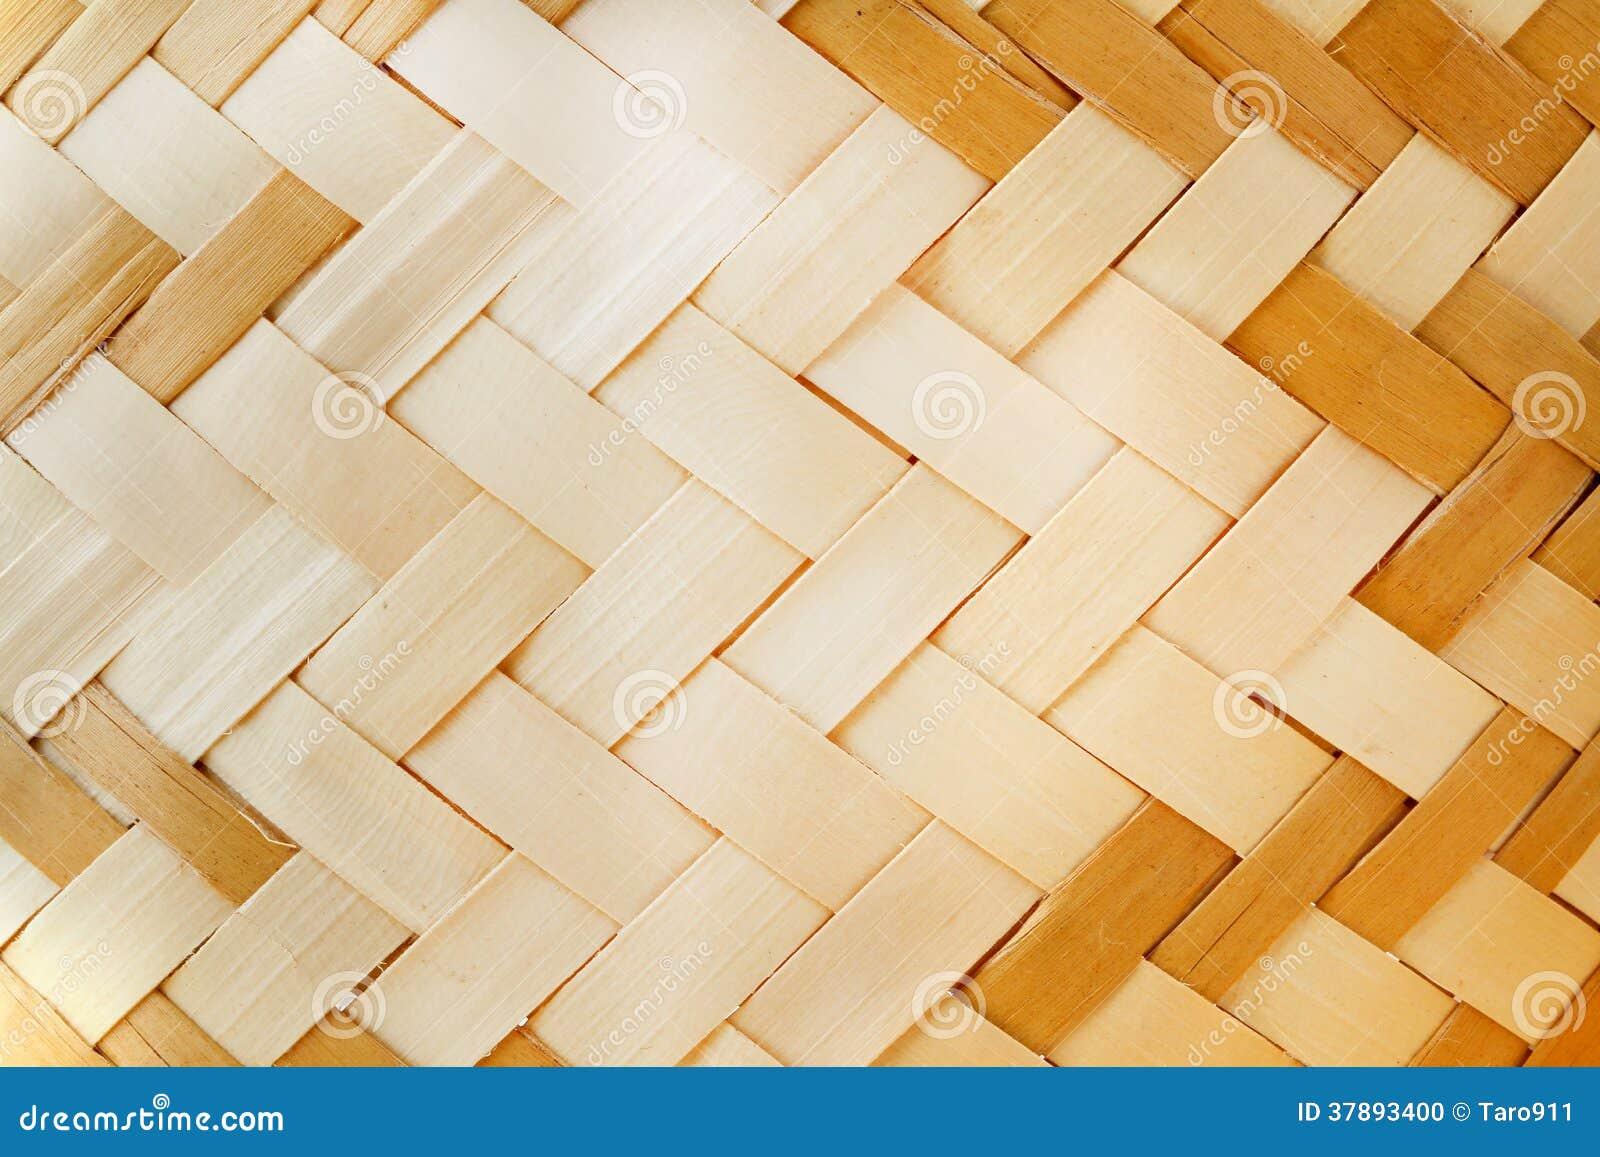 Geweven houten patroon